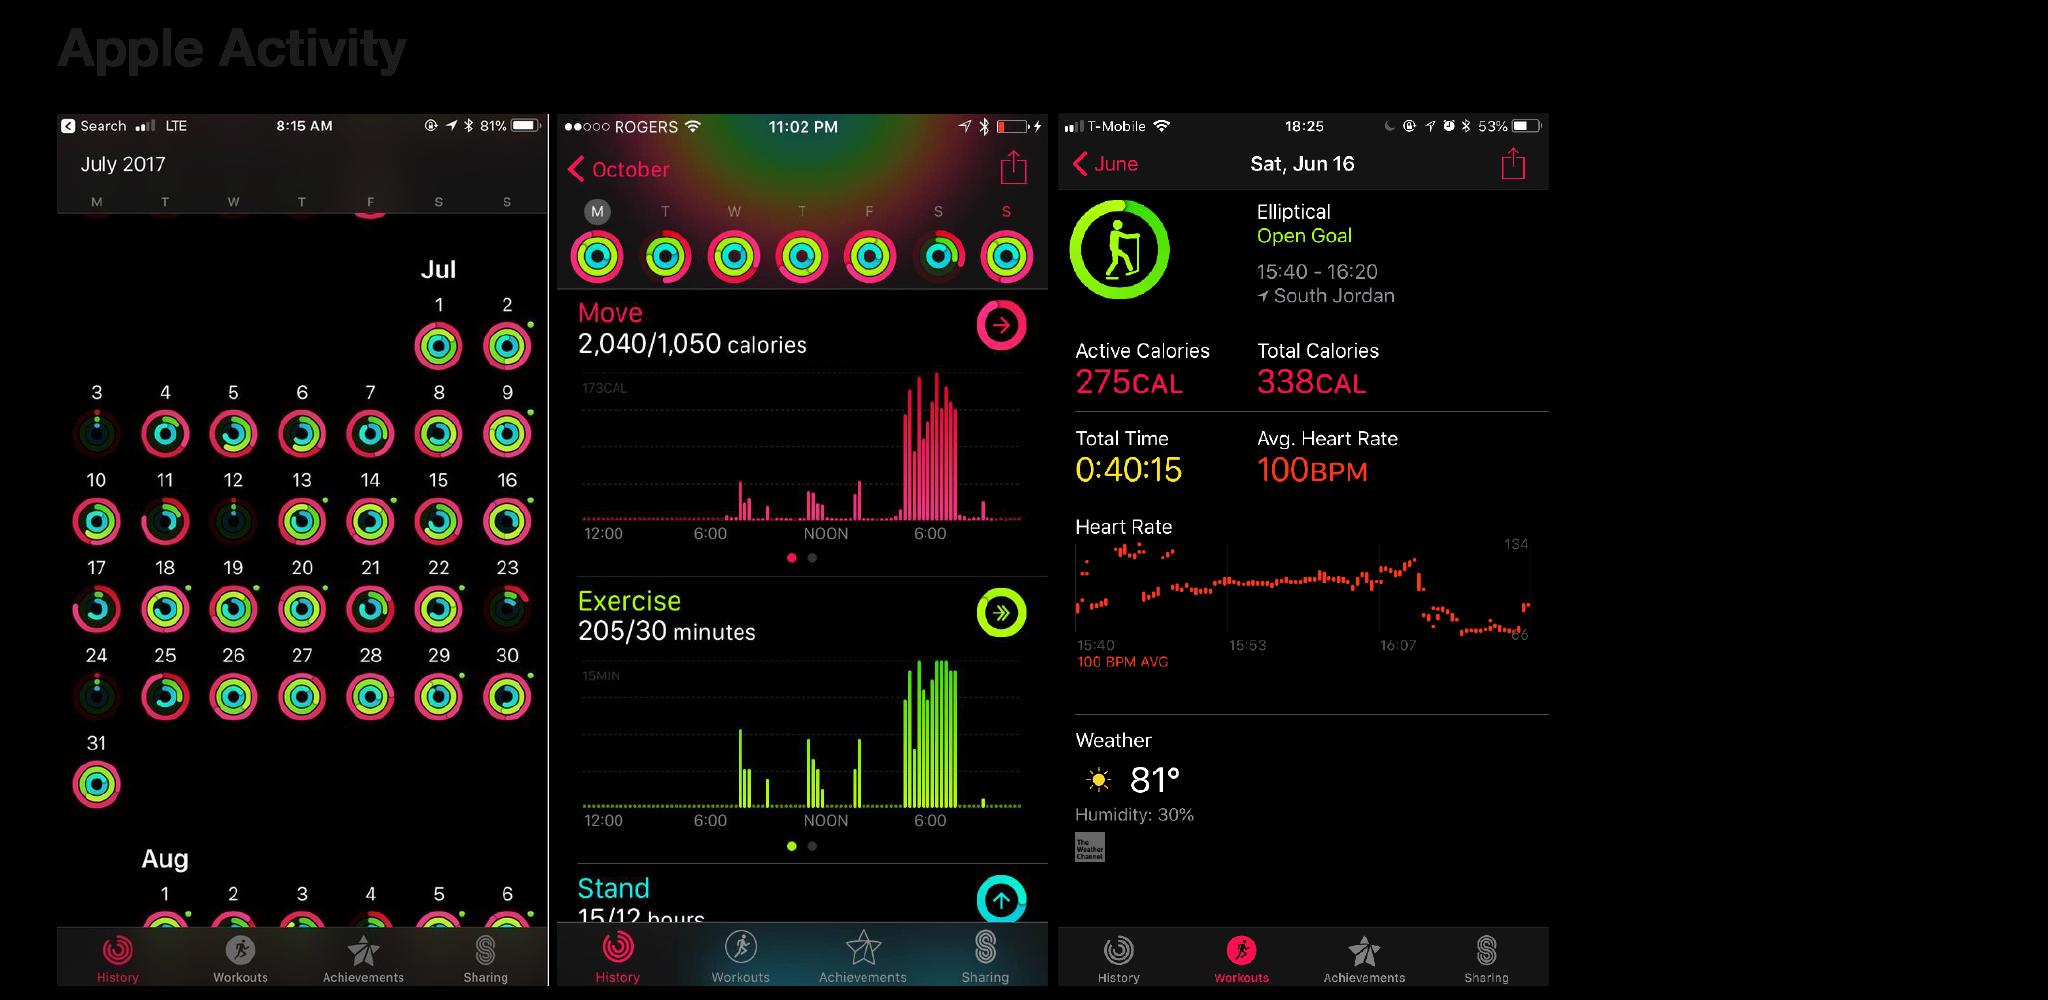 Apple Activity data visualization screens.